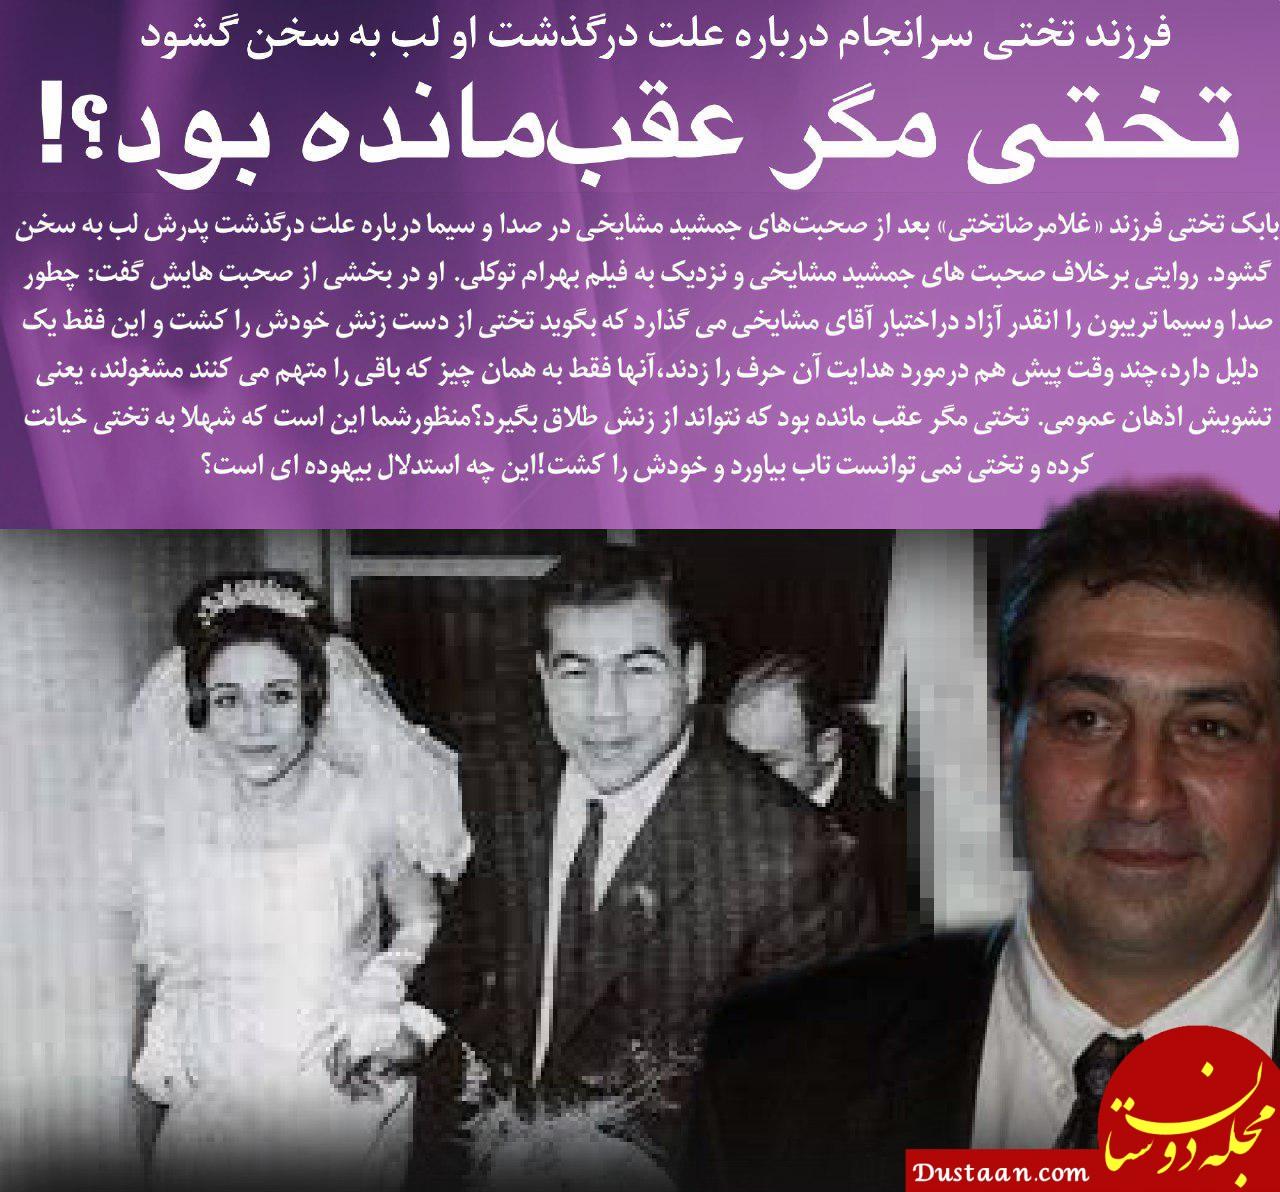 www.dustaan.com آقای مشایخی تختی لات و لمپن نبود